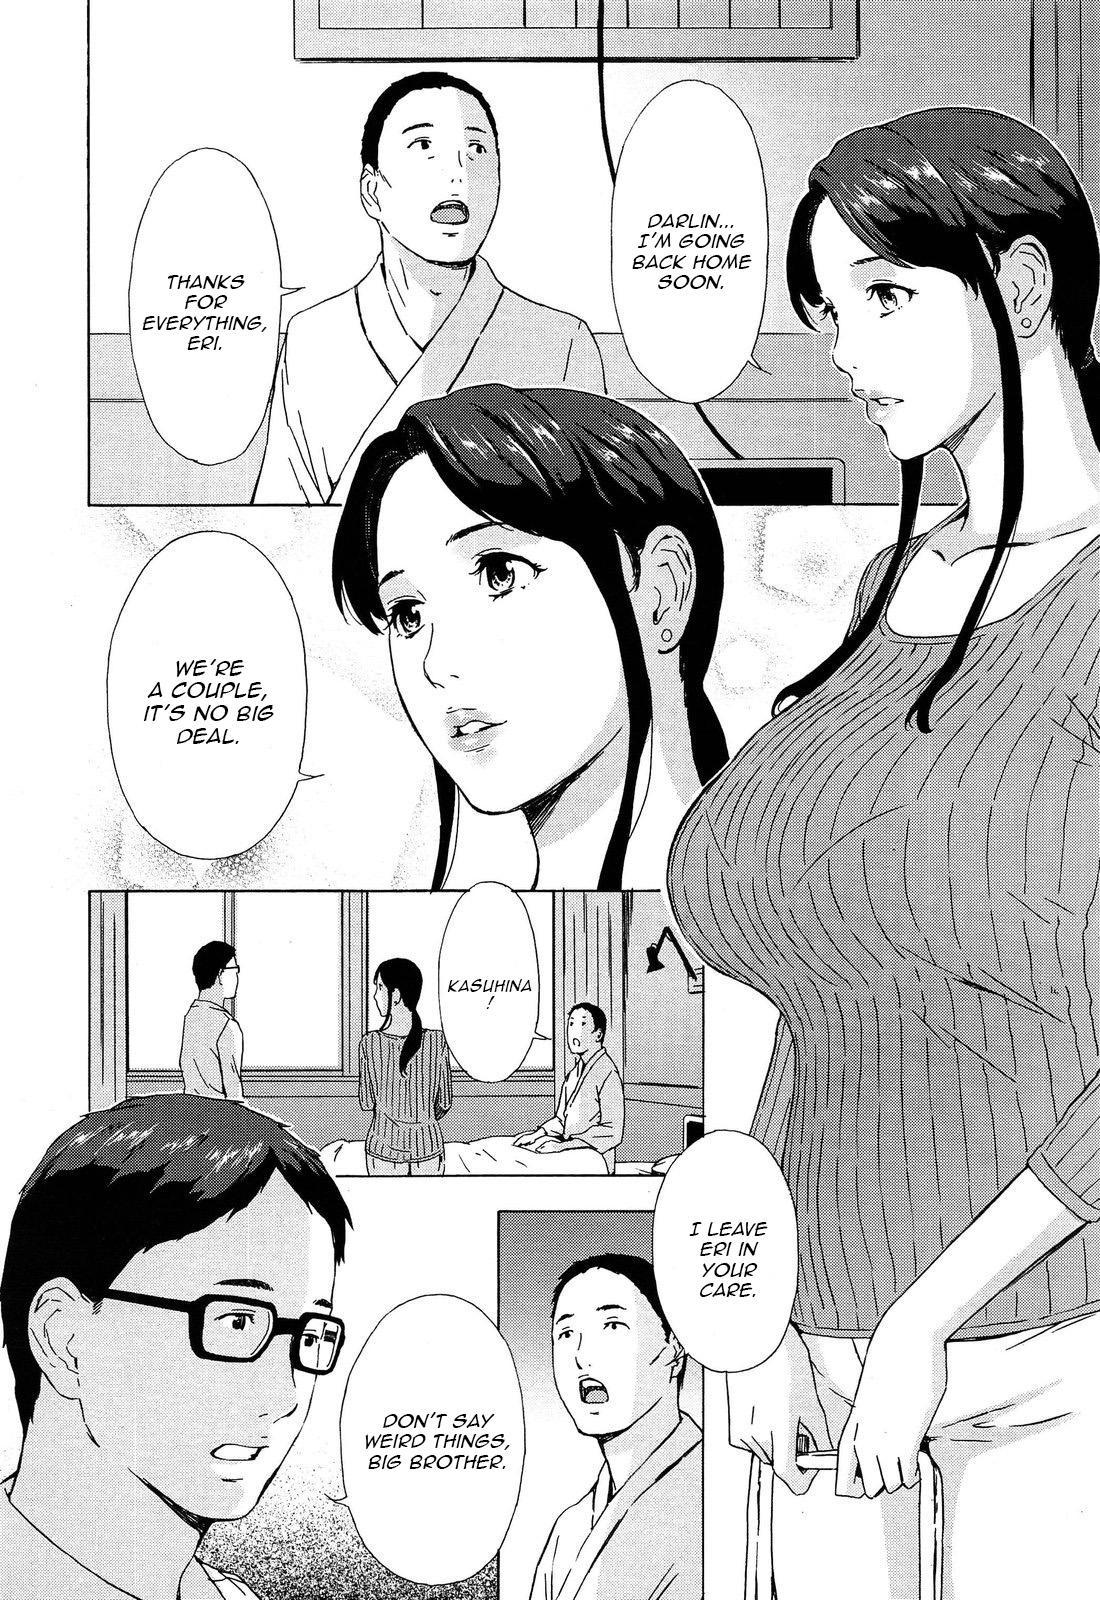 Gishi Eri no himegoto | The Secret of Eri, my Sister in Law 1-2 1